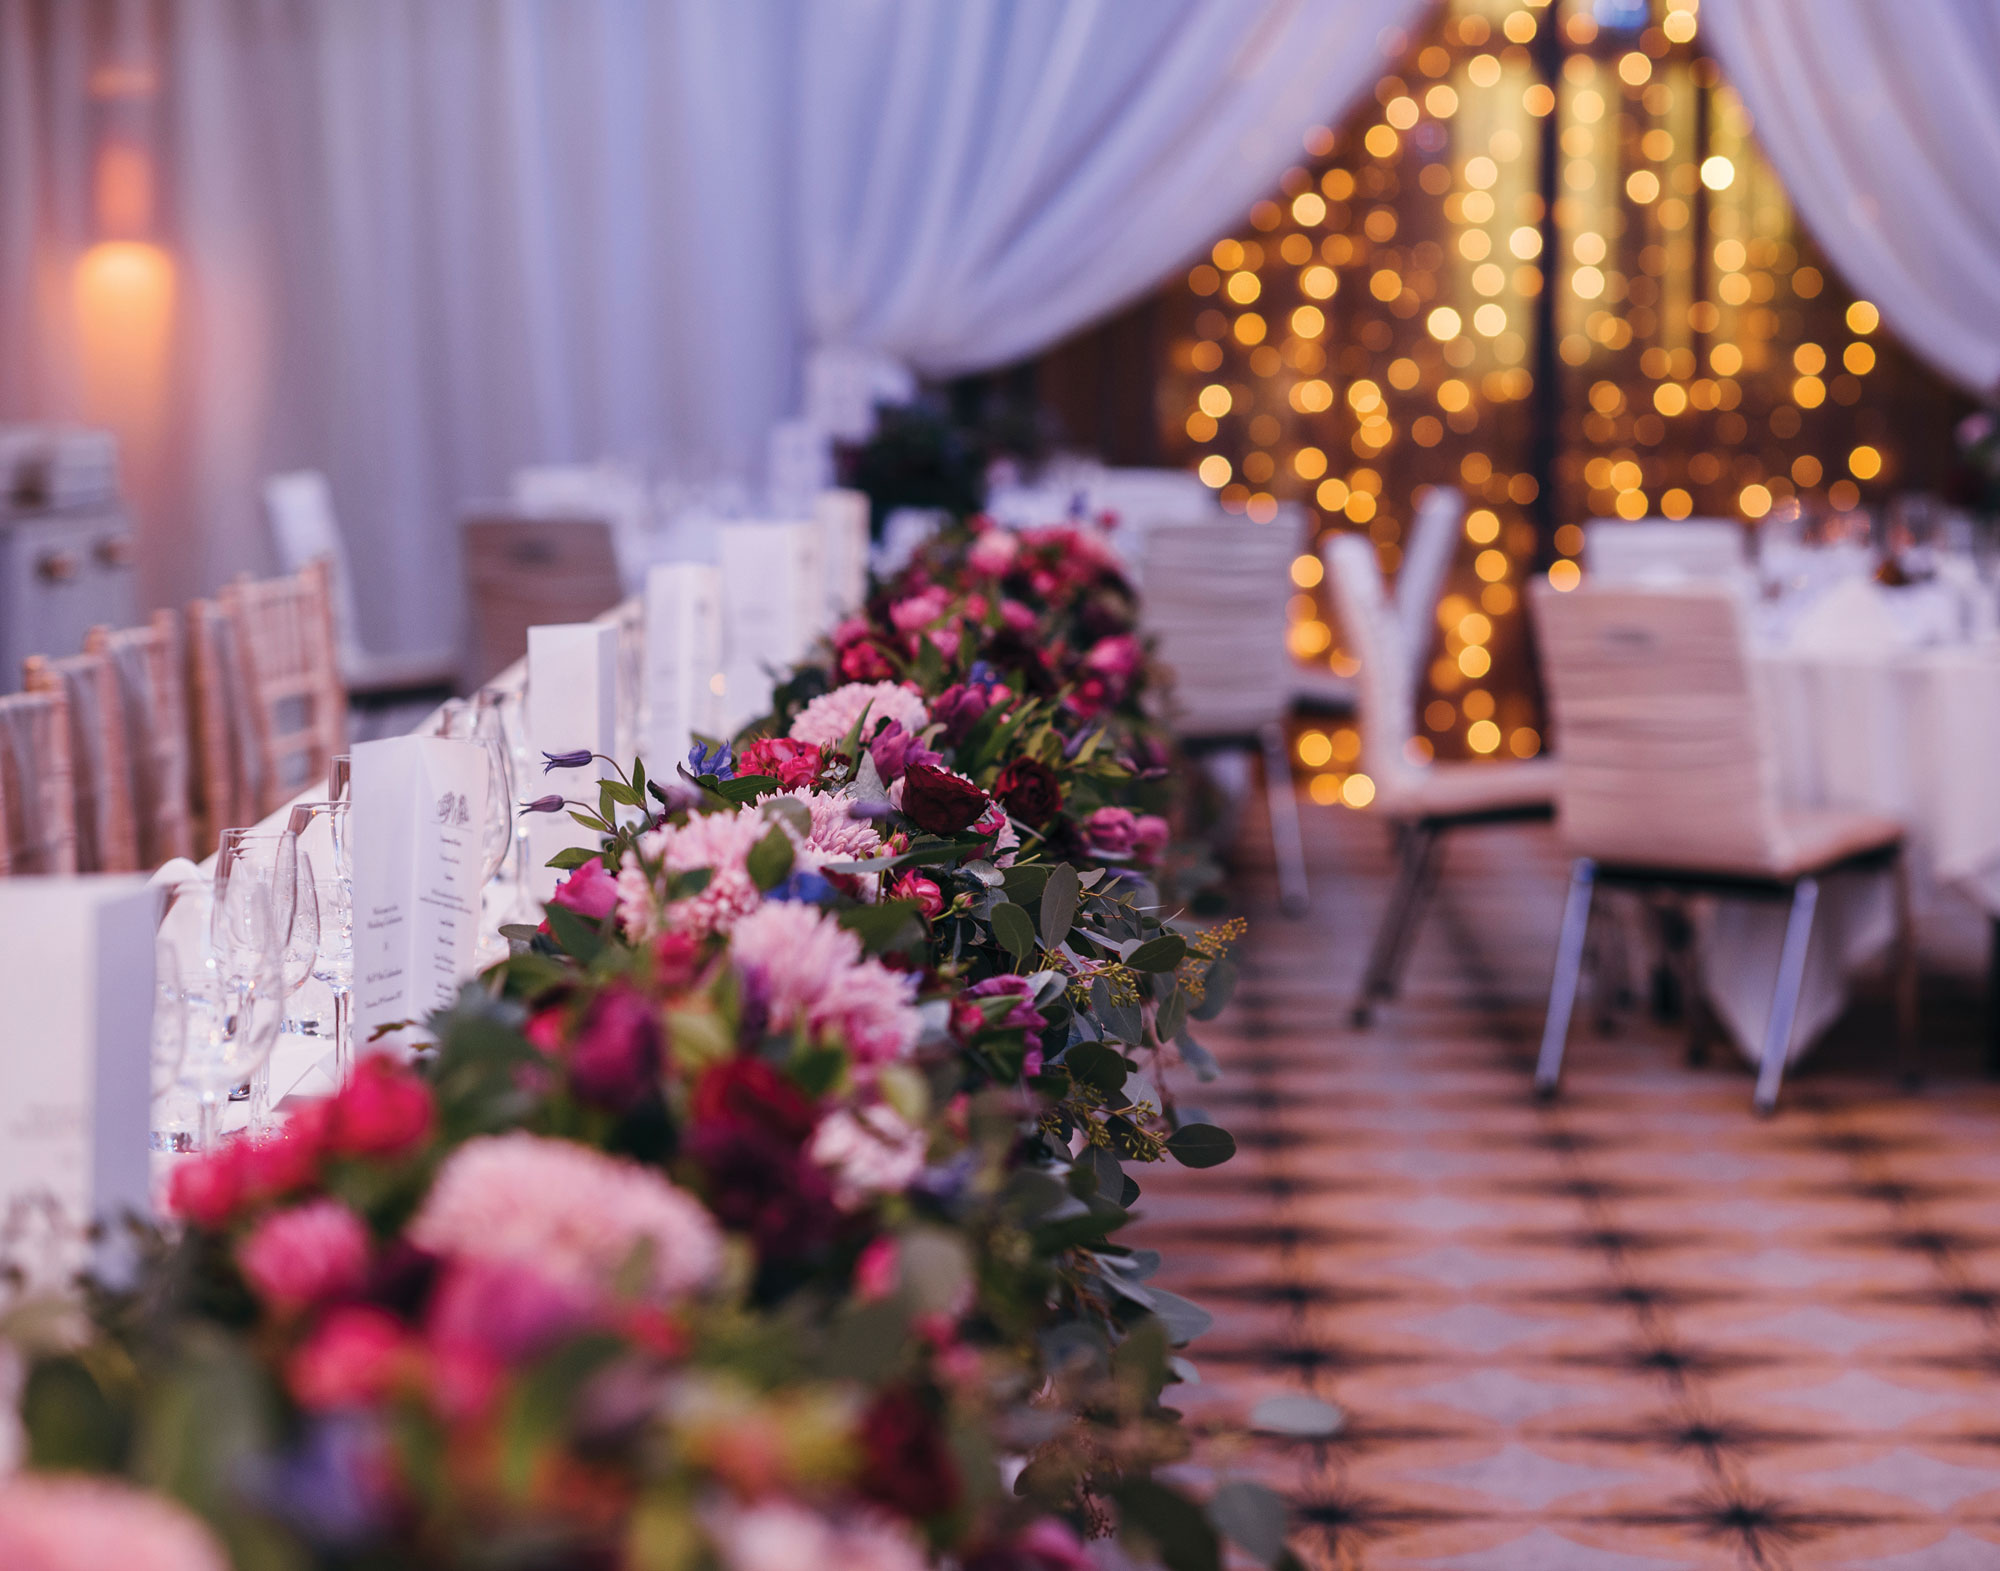 belfast_city_centre_wedding_merchant_hotel_16.jpg